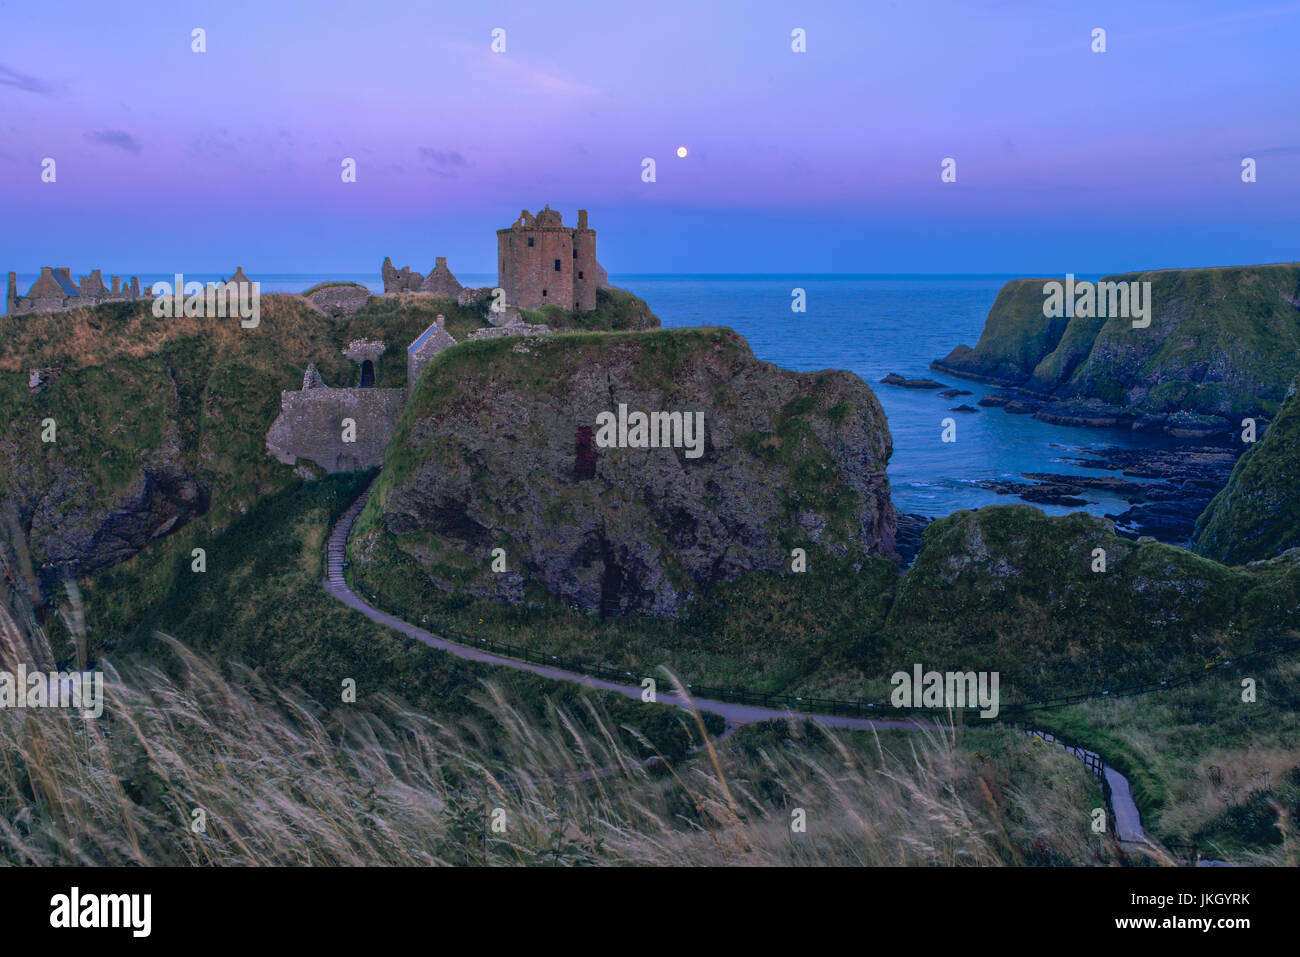 Dunottar Castle, Scotland, United Kingdom, Europe - Stock Image